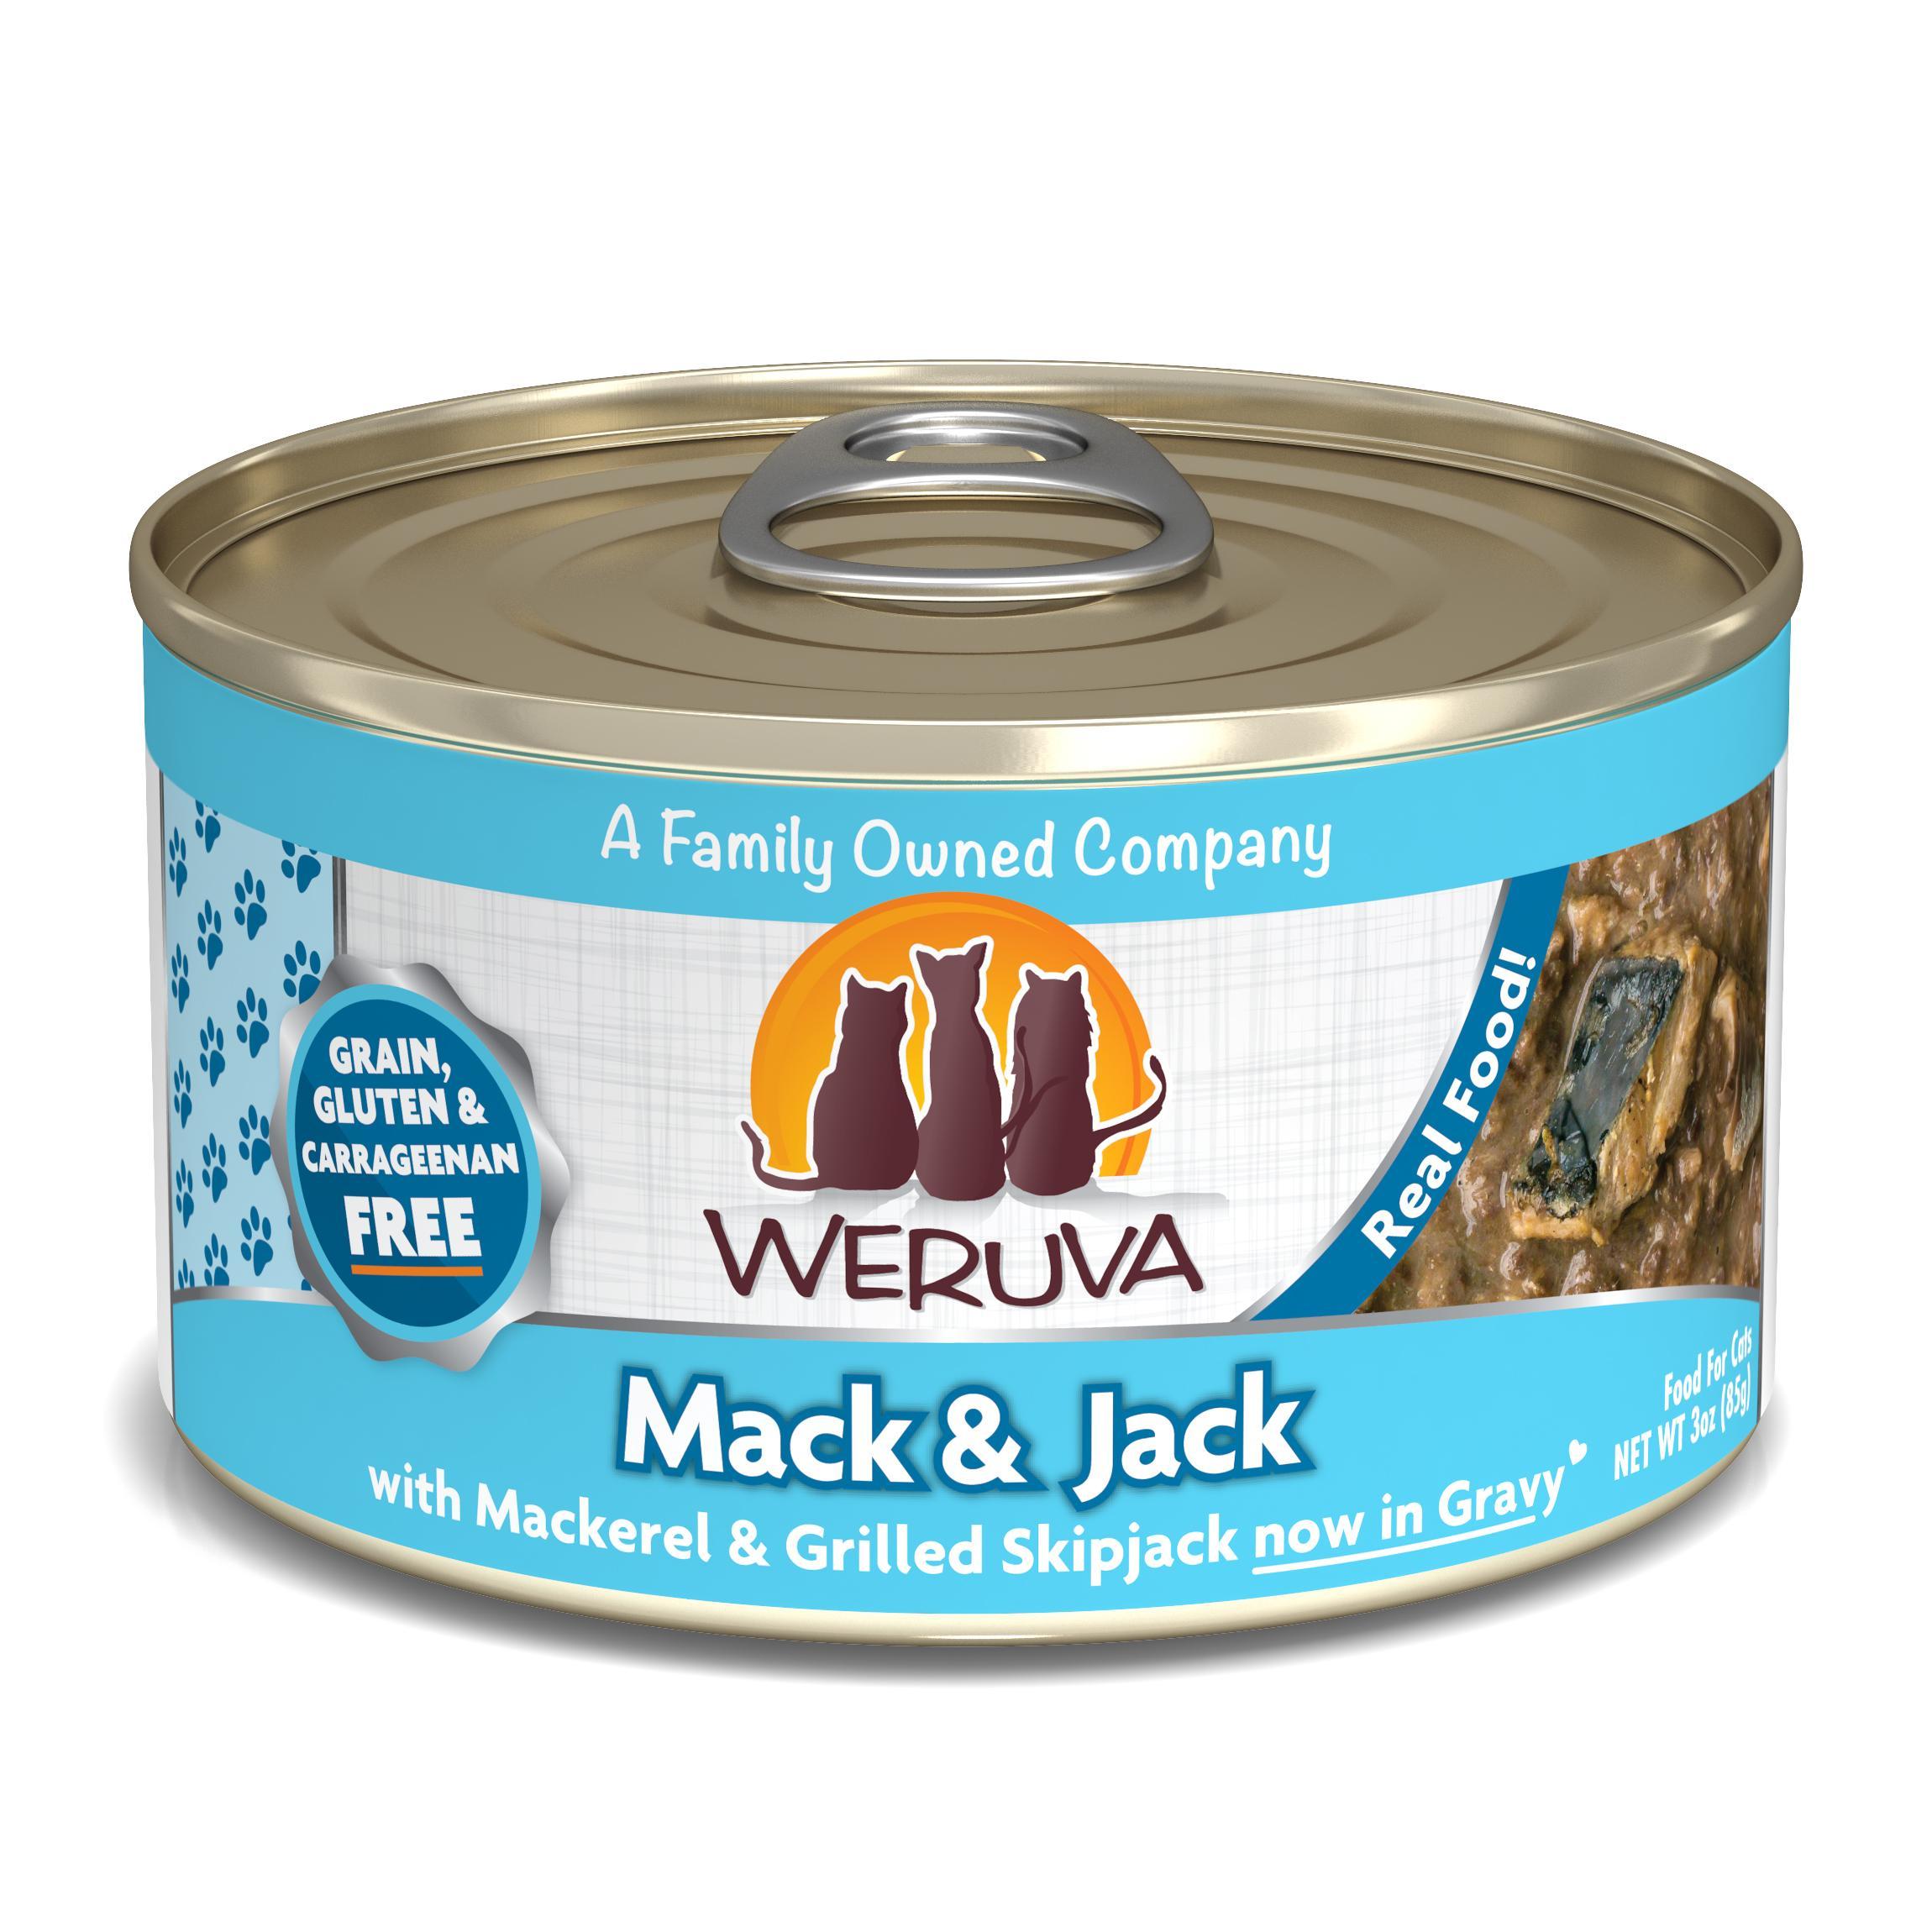 Weruva Cat Classic Mack and Jack with Mackerel & Grilled Skipjack Grain-Free Wet Cat Food Image